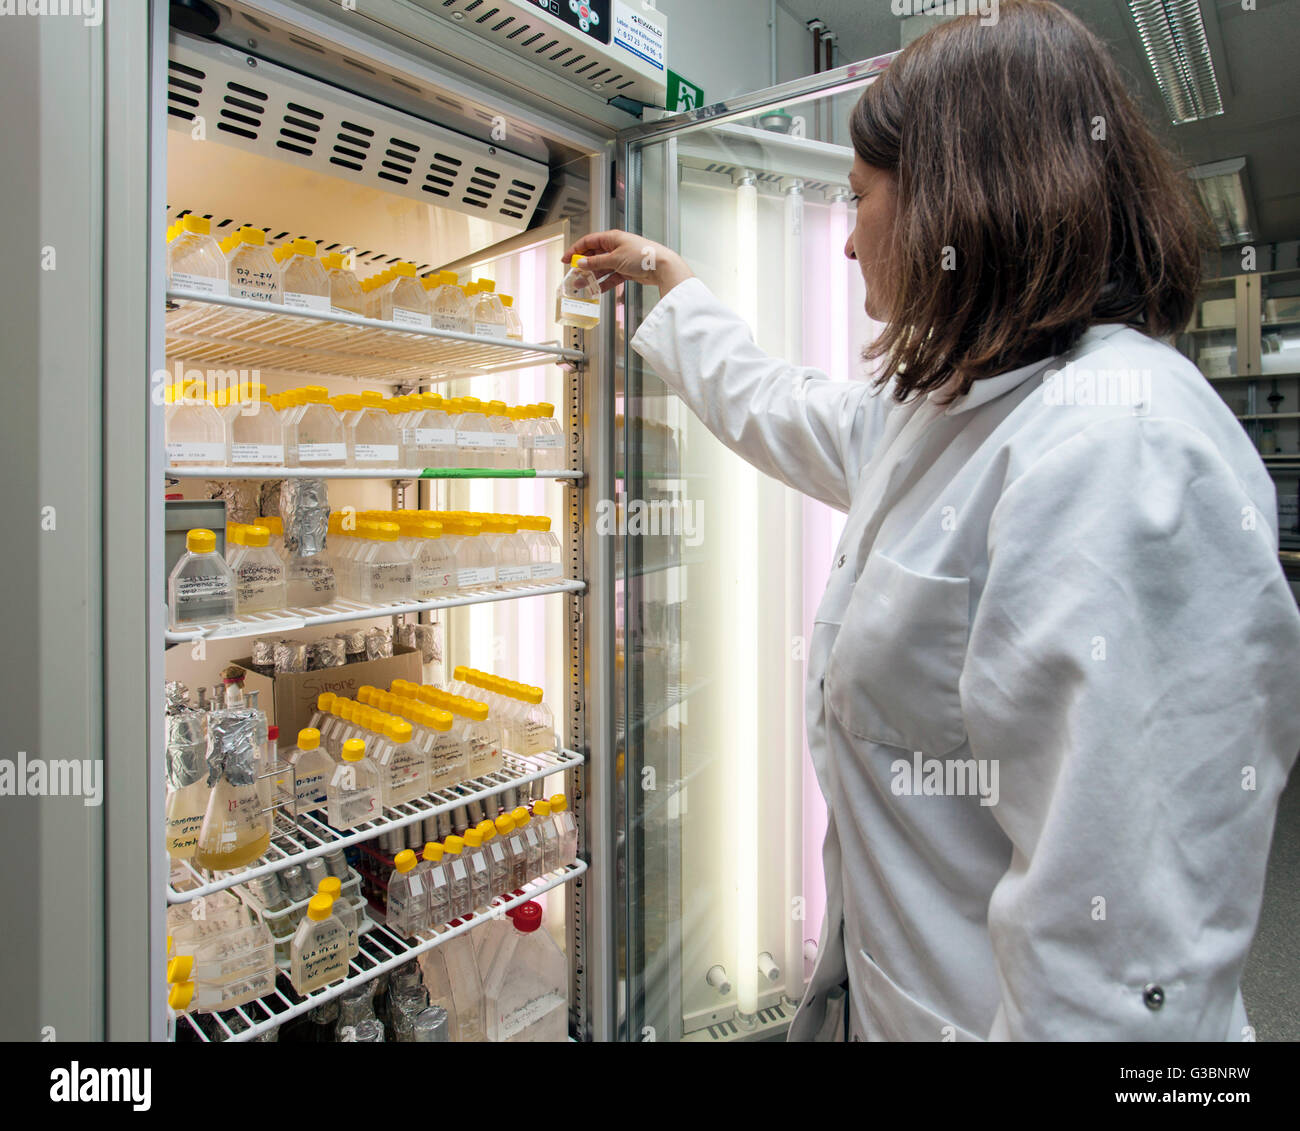 Scientist at a incubator in genetics laboratory - Stock Image